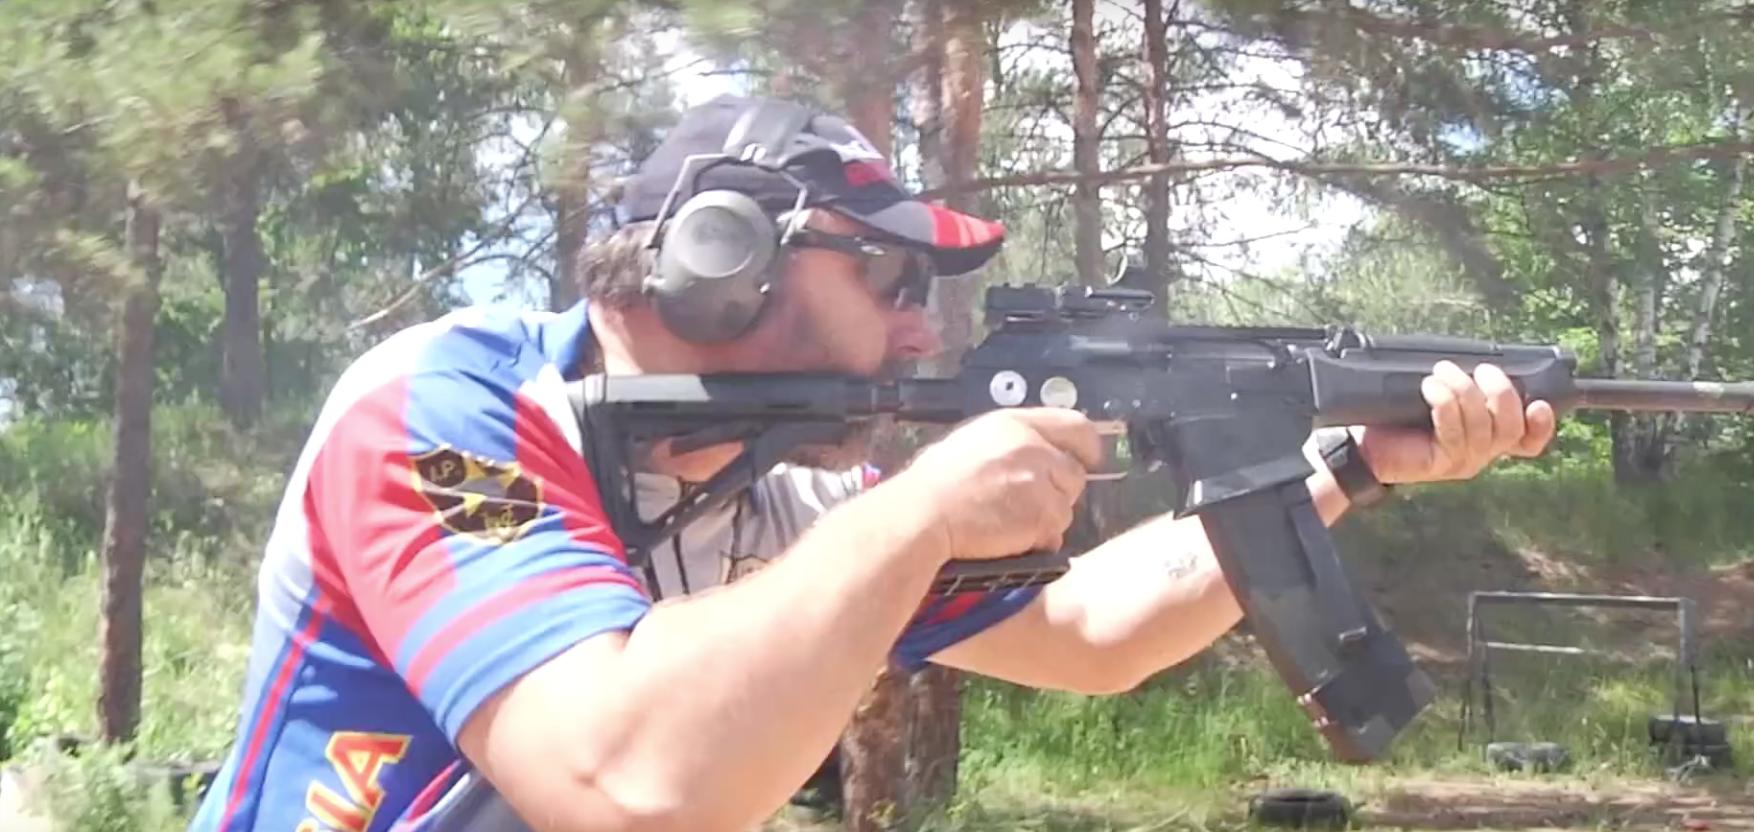 Meet Andrey Kirisenko: The Fastest Russian Shotgun Shooter On The Planet Featured